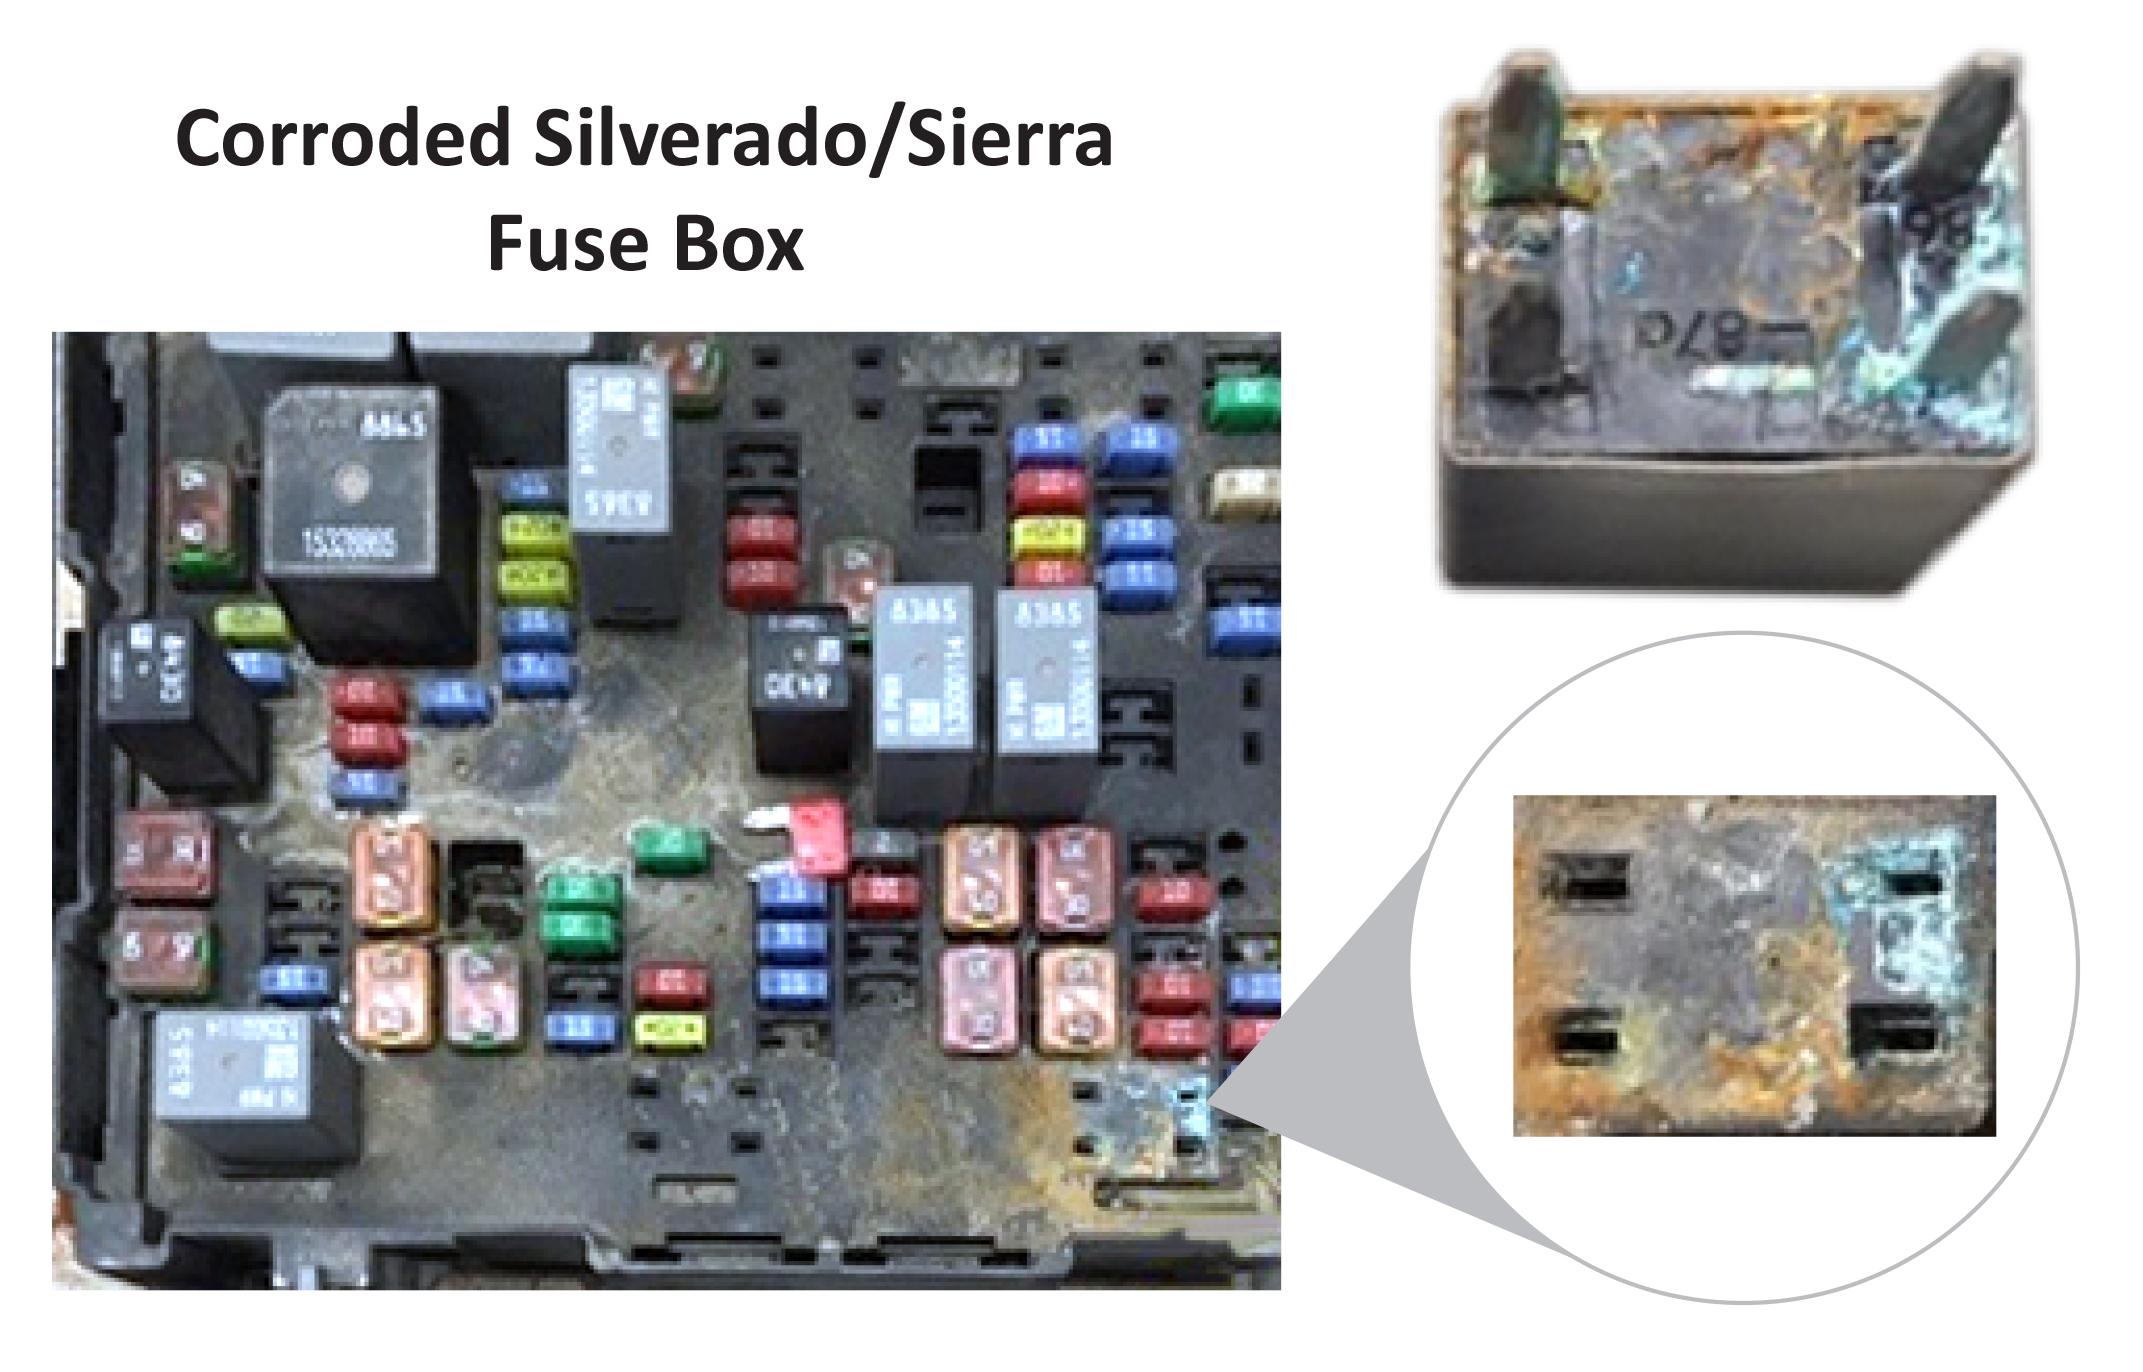 Silverado dead battery — Ricks Free Auto Repair Advice Ricks Free Auto  Repair Advice | Automotive Repair Tips and How-ToRick's Free Auto Repair Advice